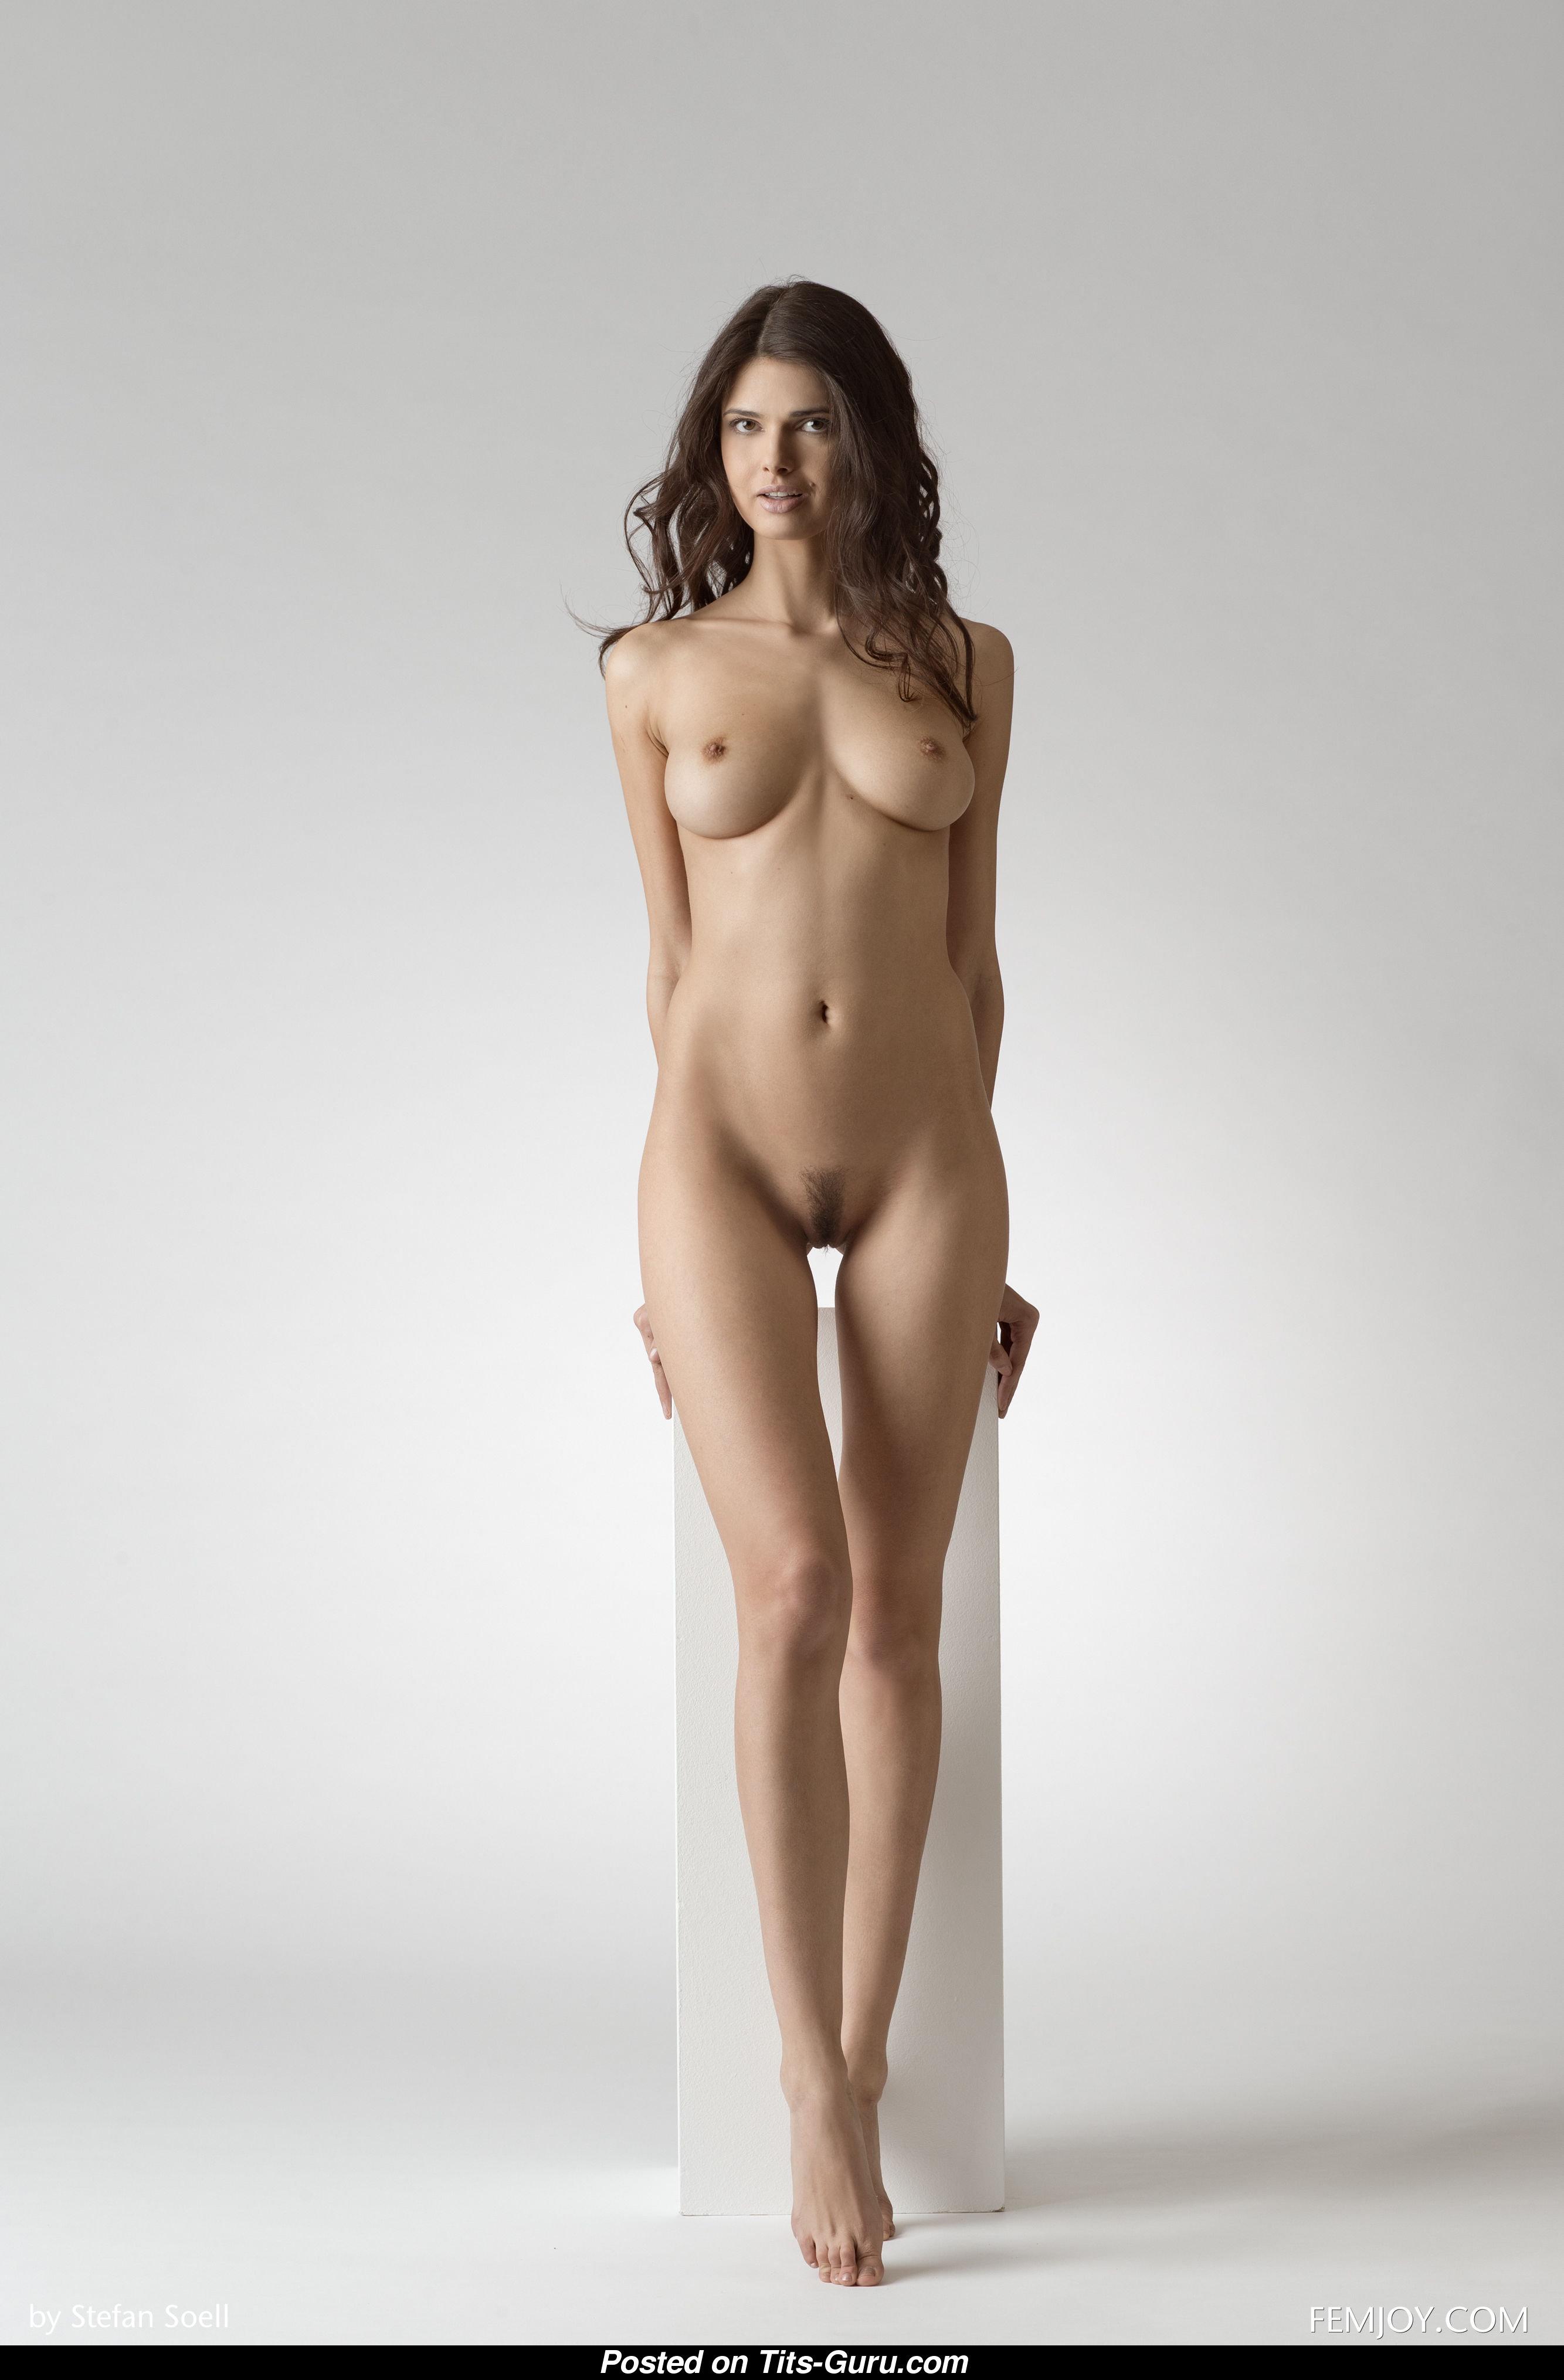 Jasmine Andreas - Nude Brunette With Medium Boobies Picture  0504 -4563